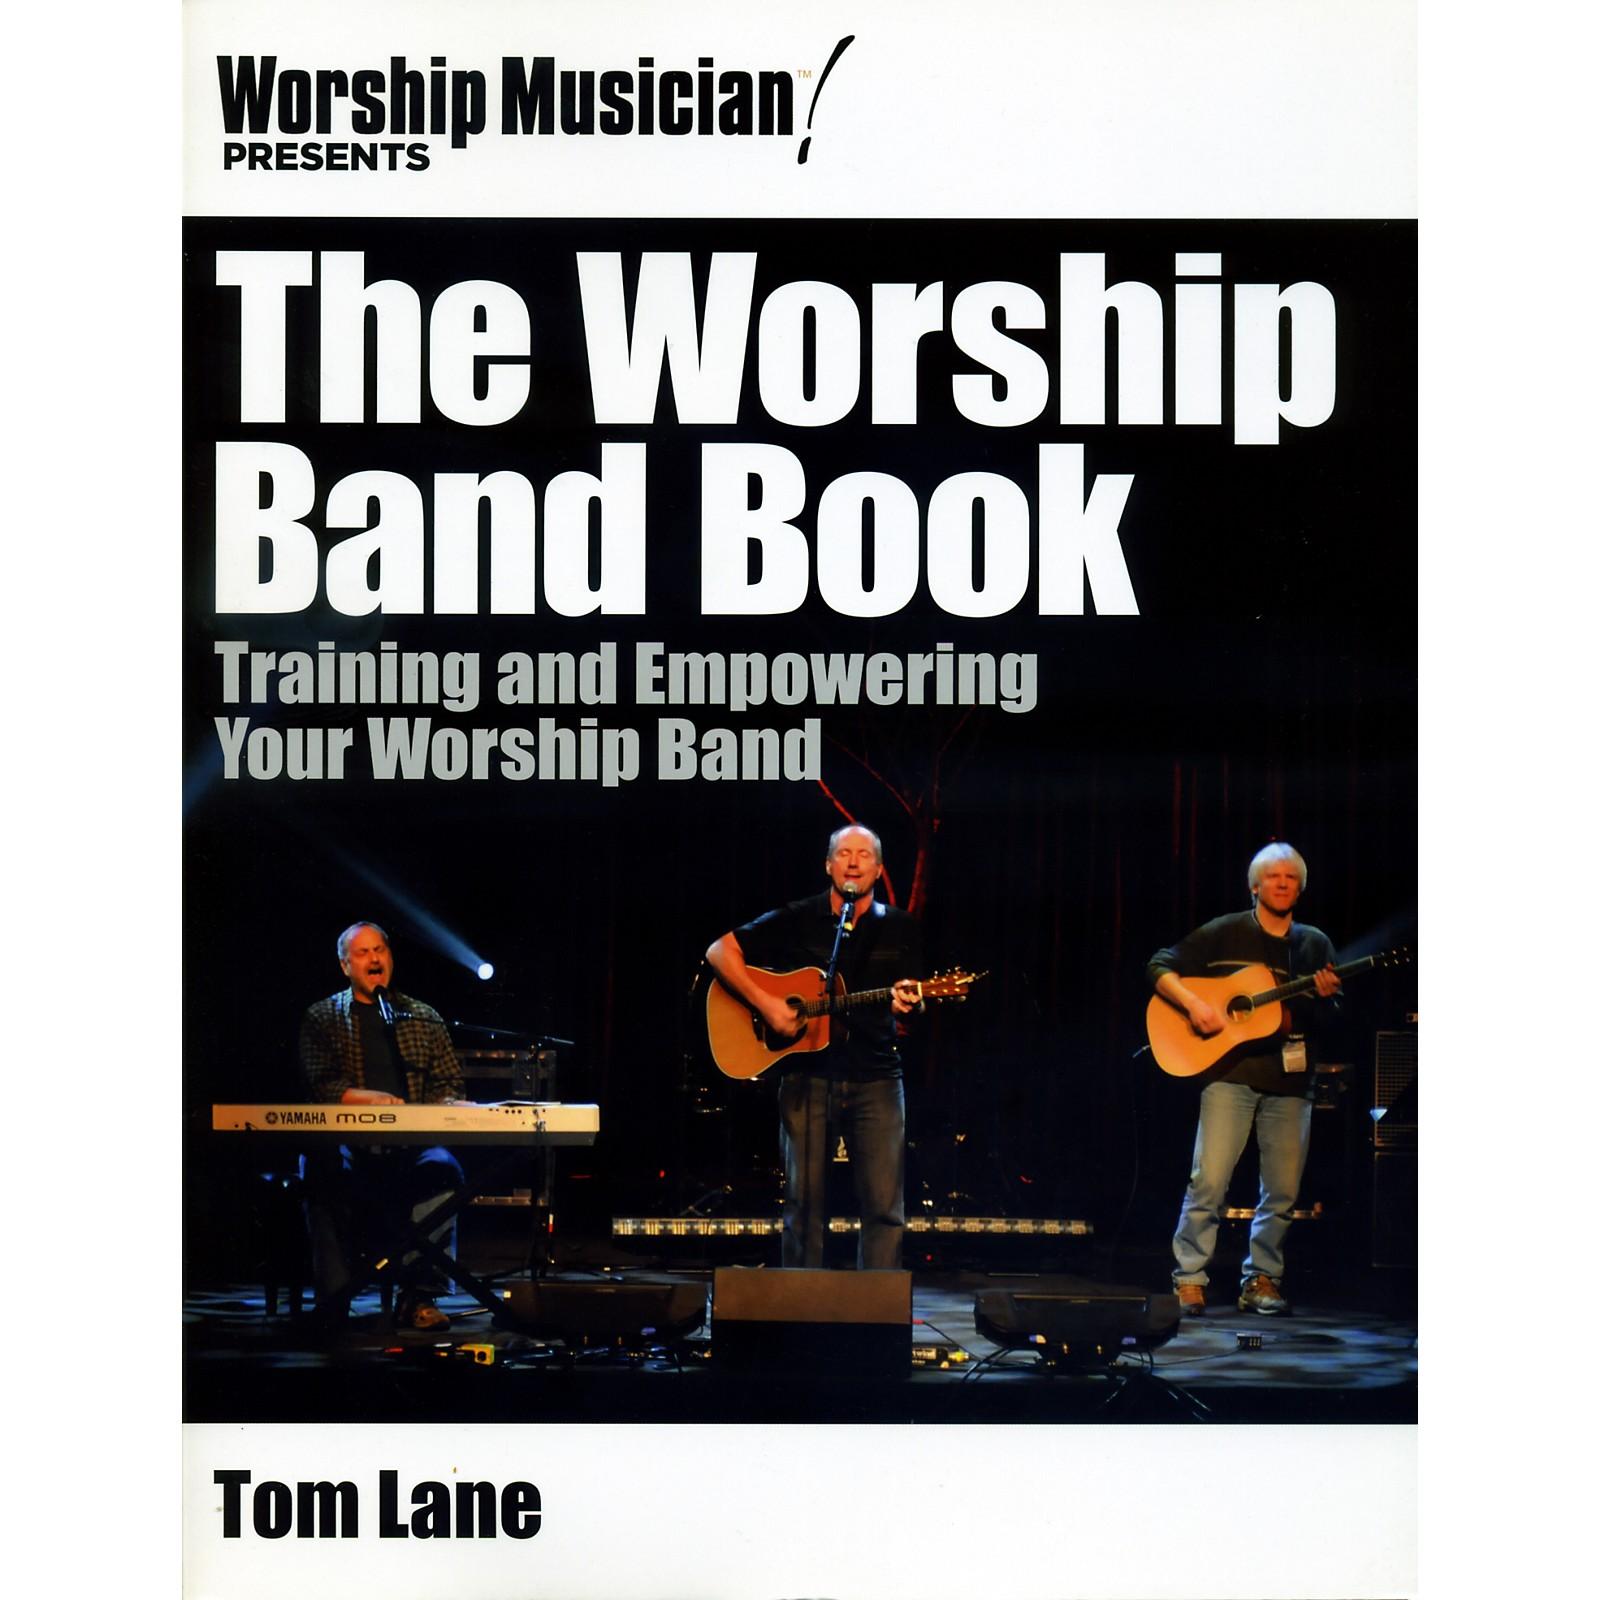 Hal Leonard Worship Musician! Presents The Worship Band Book